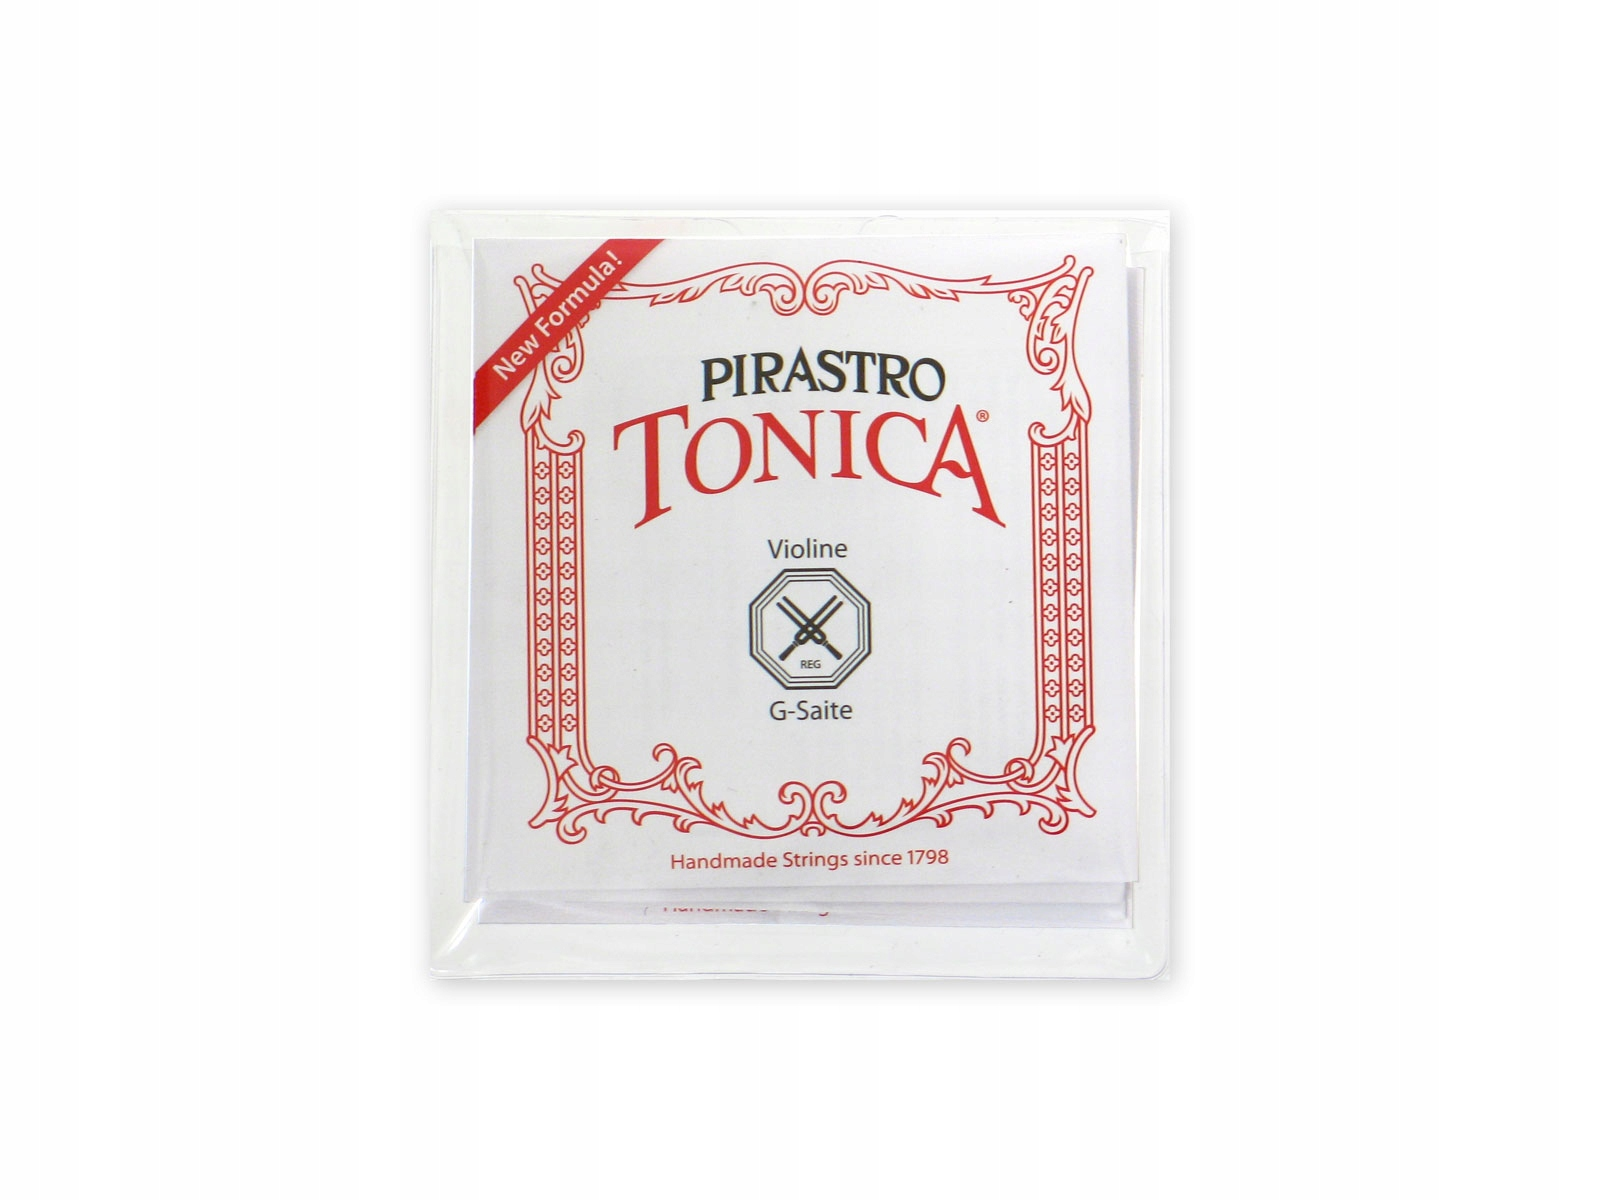 Pirastro Tonica husle